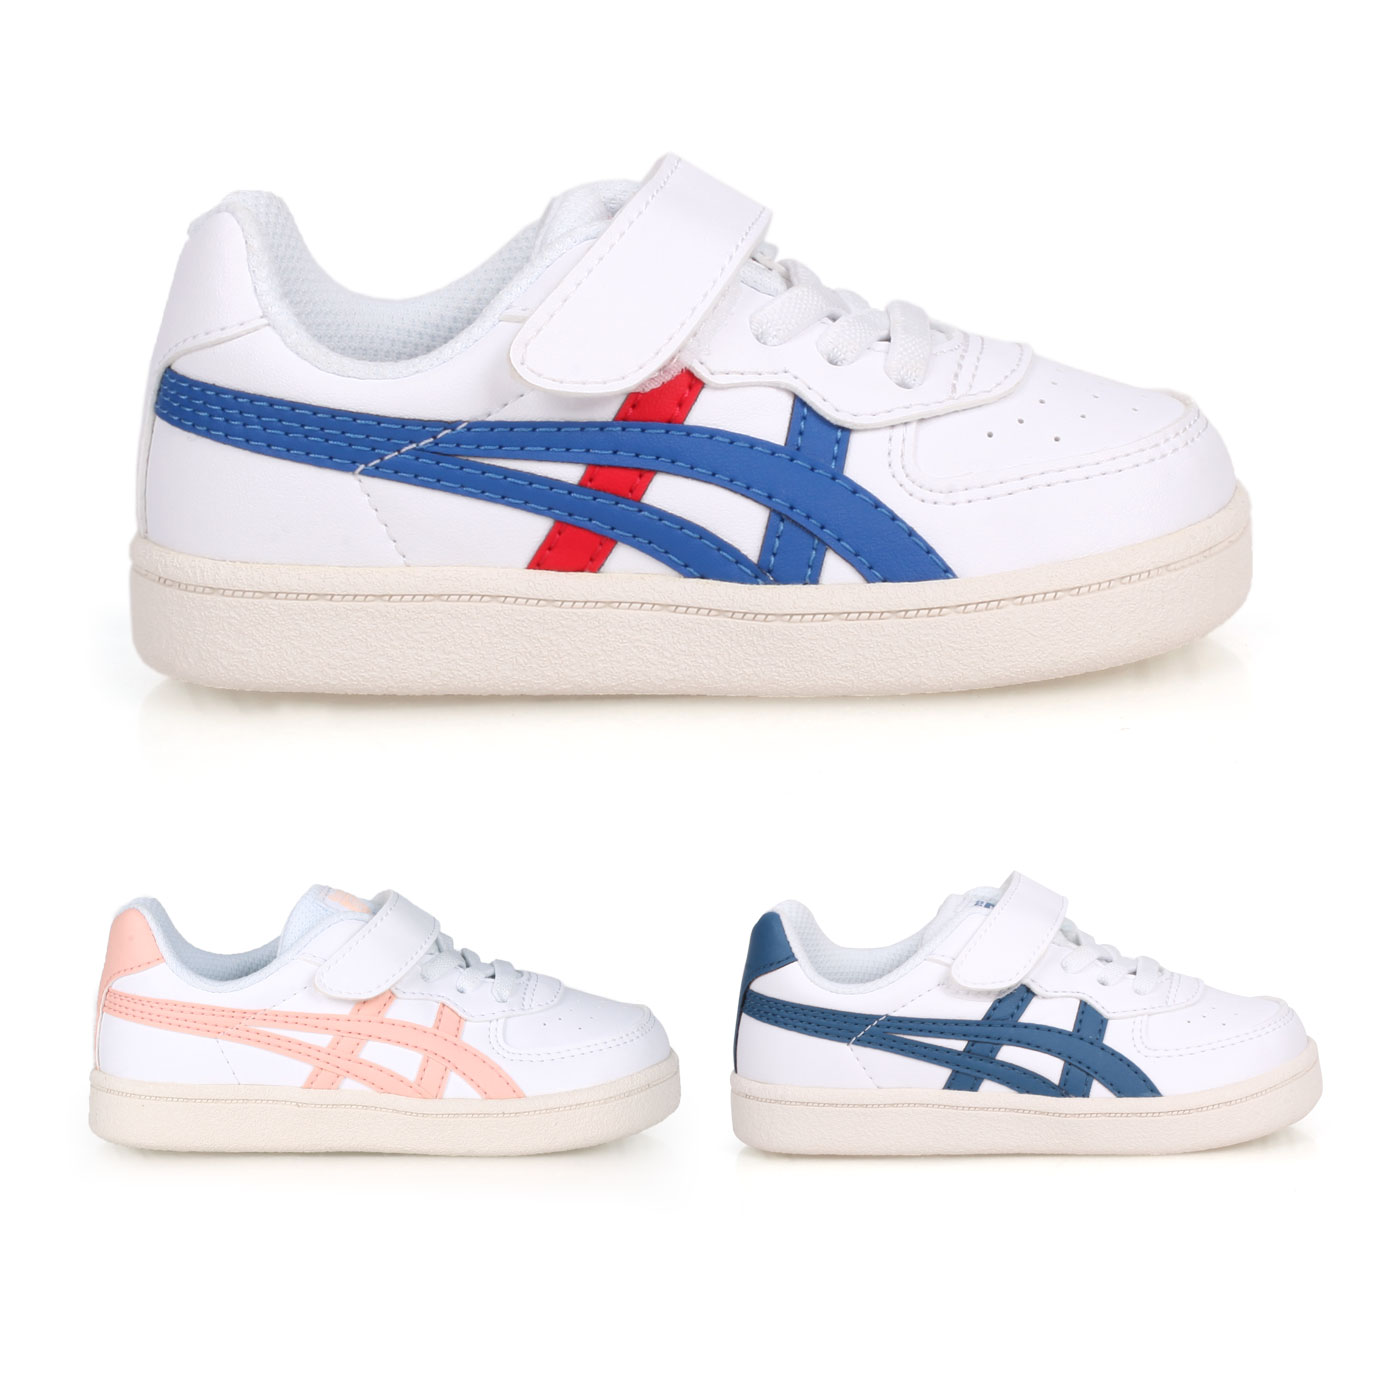 ASICS 小童休閒運動鞋  @GSM TS@1184A023-100